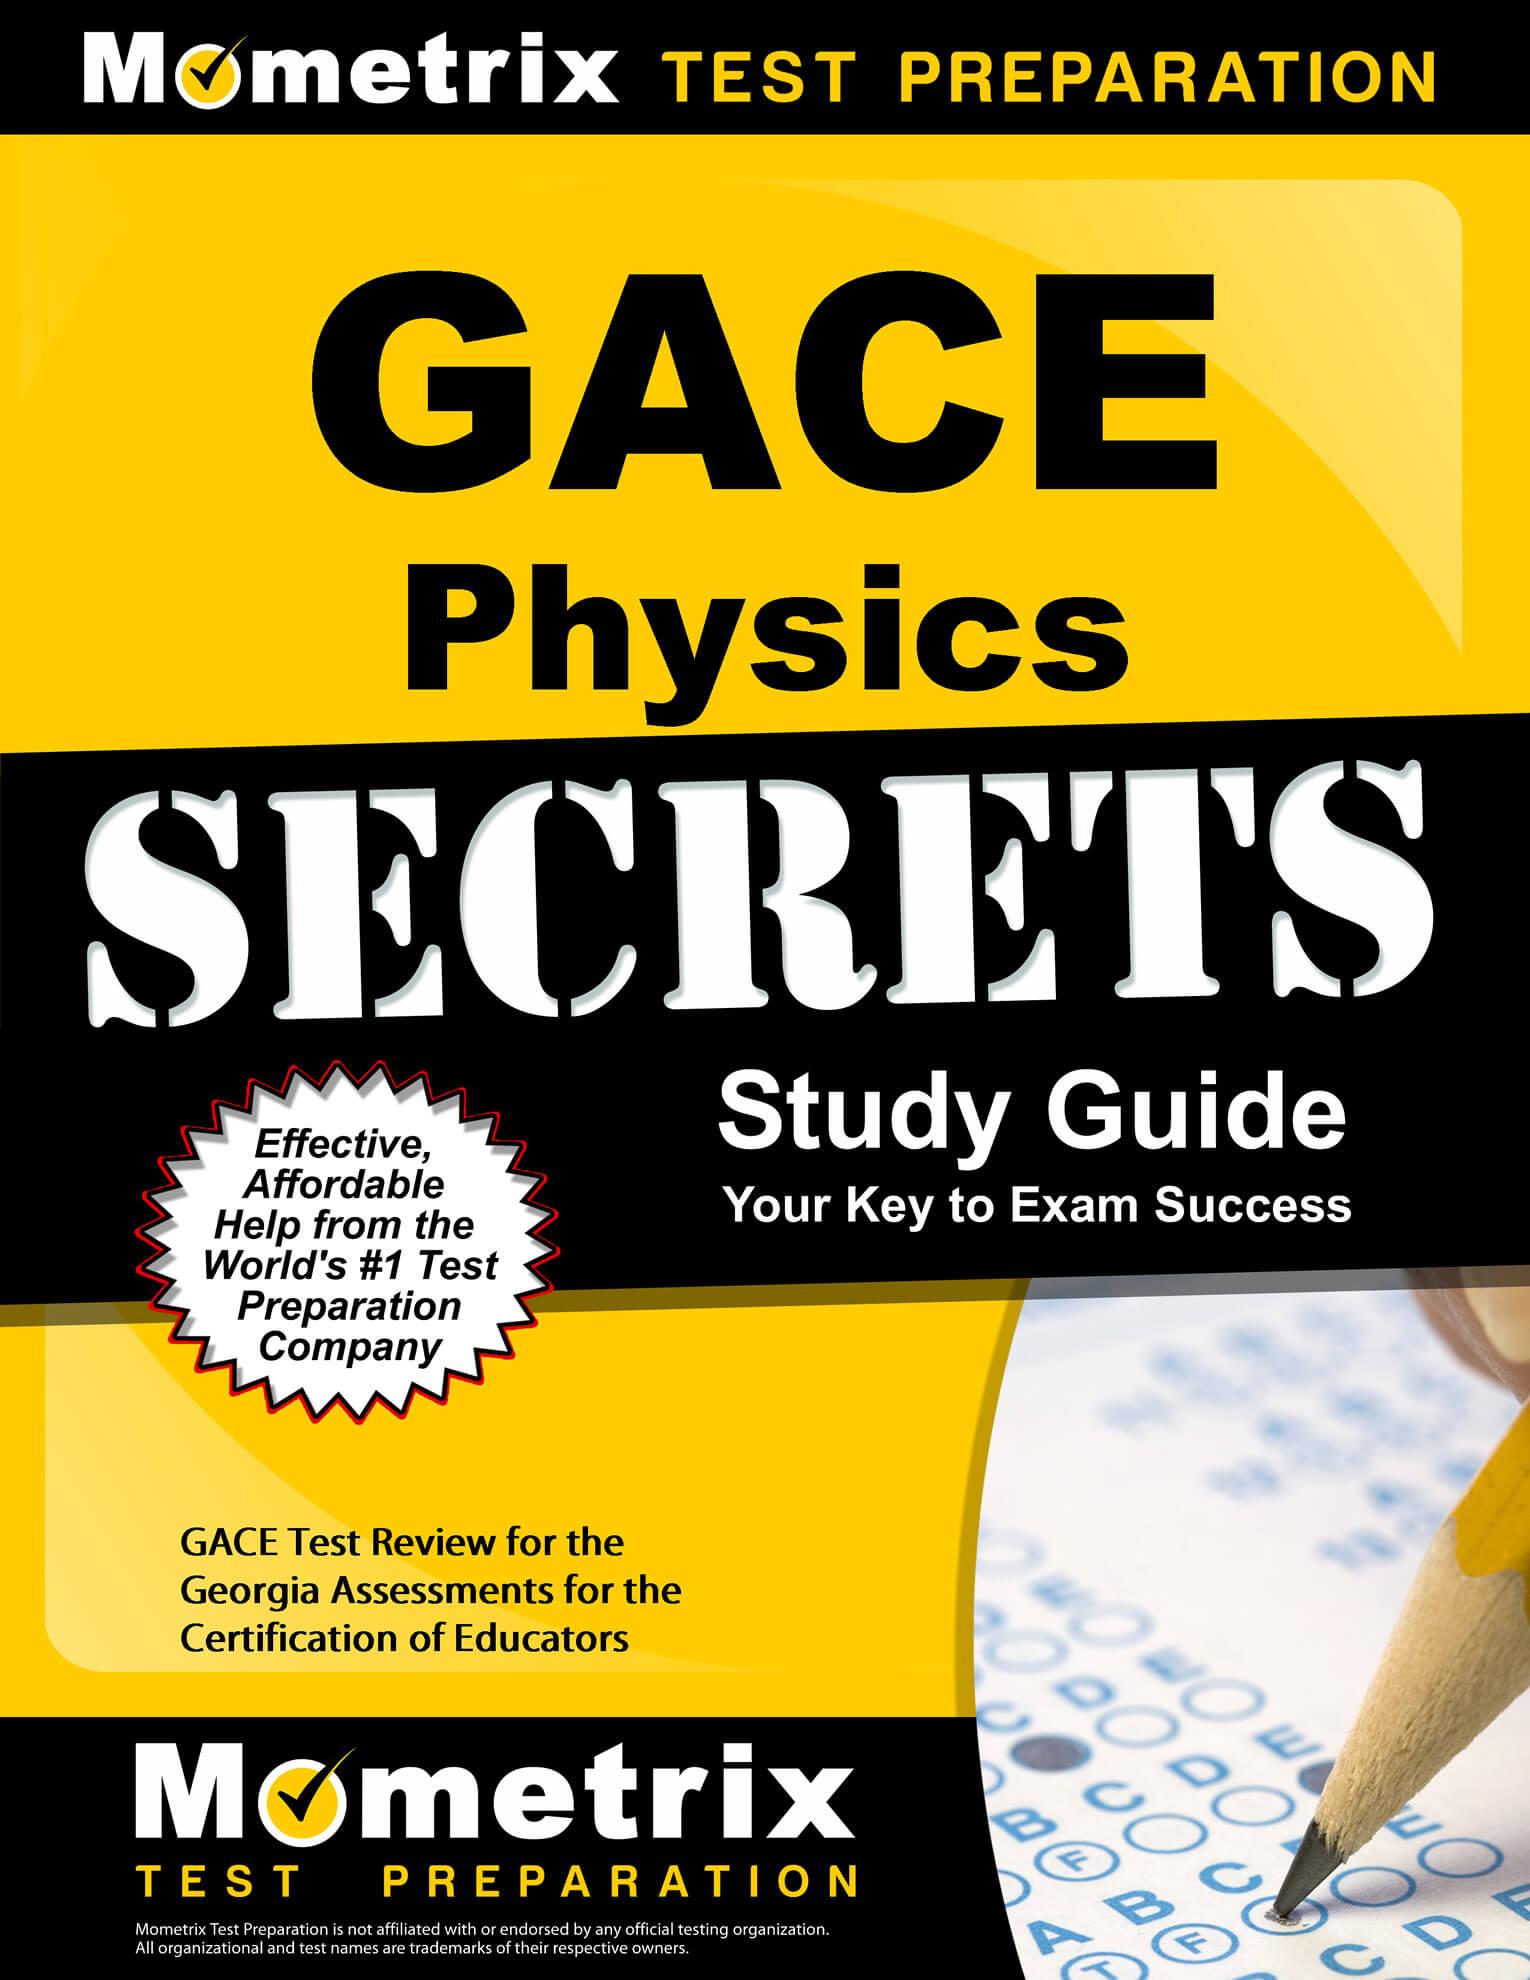 GACE Physics Study Guide